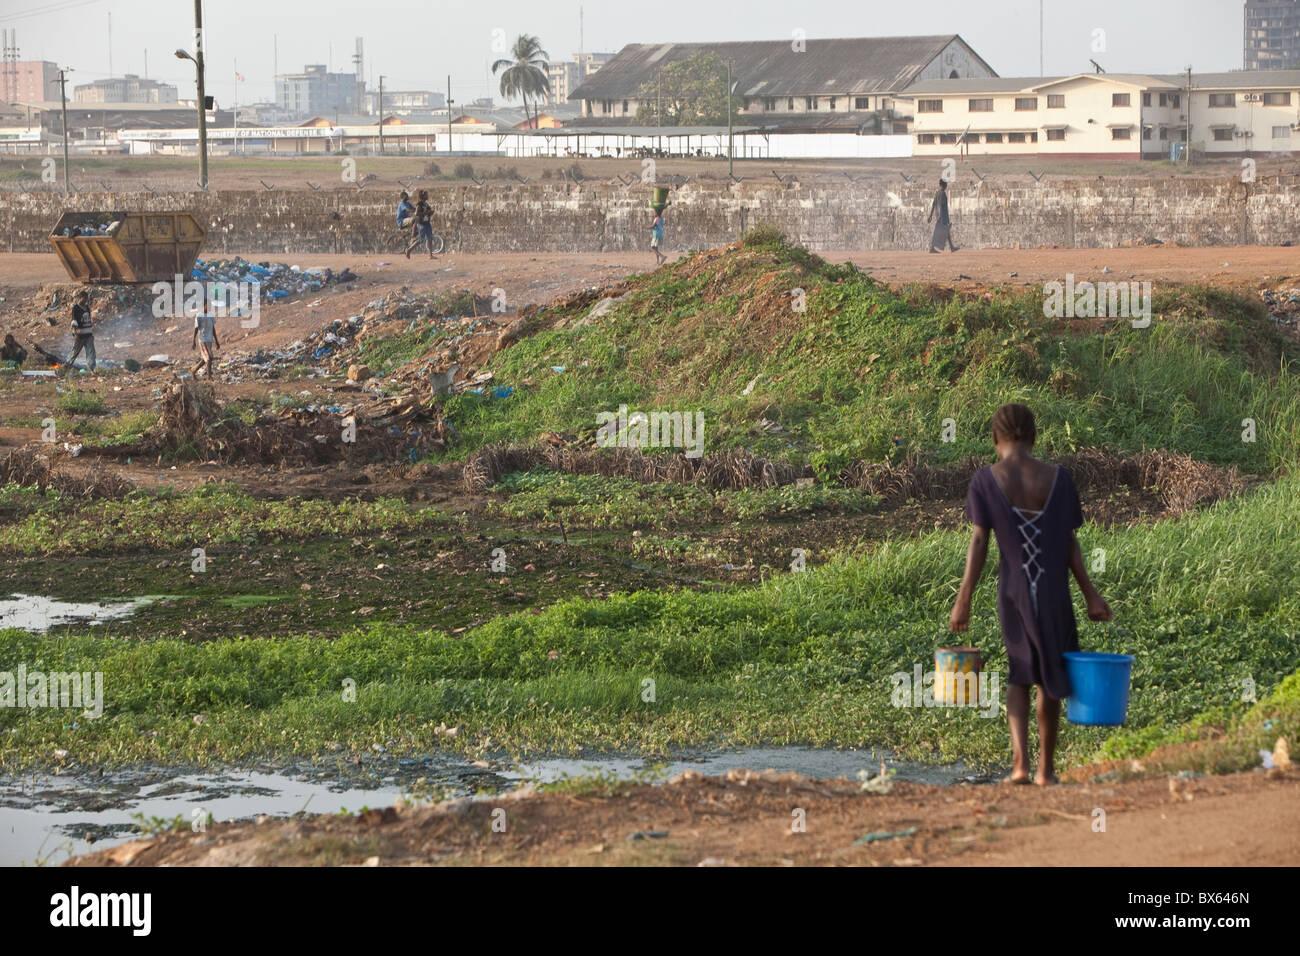 City scene along oceanfront | Monrovia, Liberia, West Africa. - Stock Image